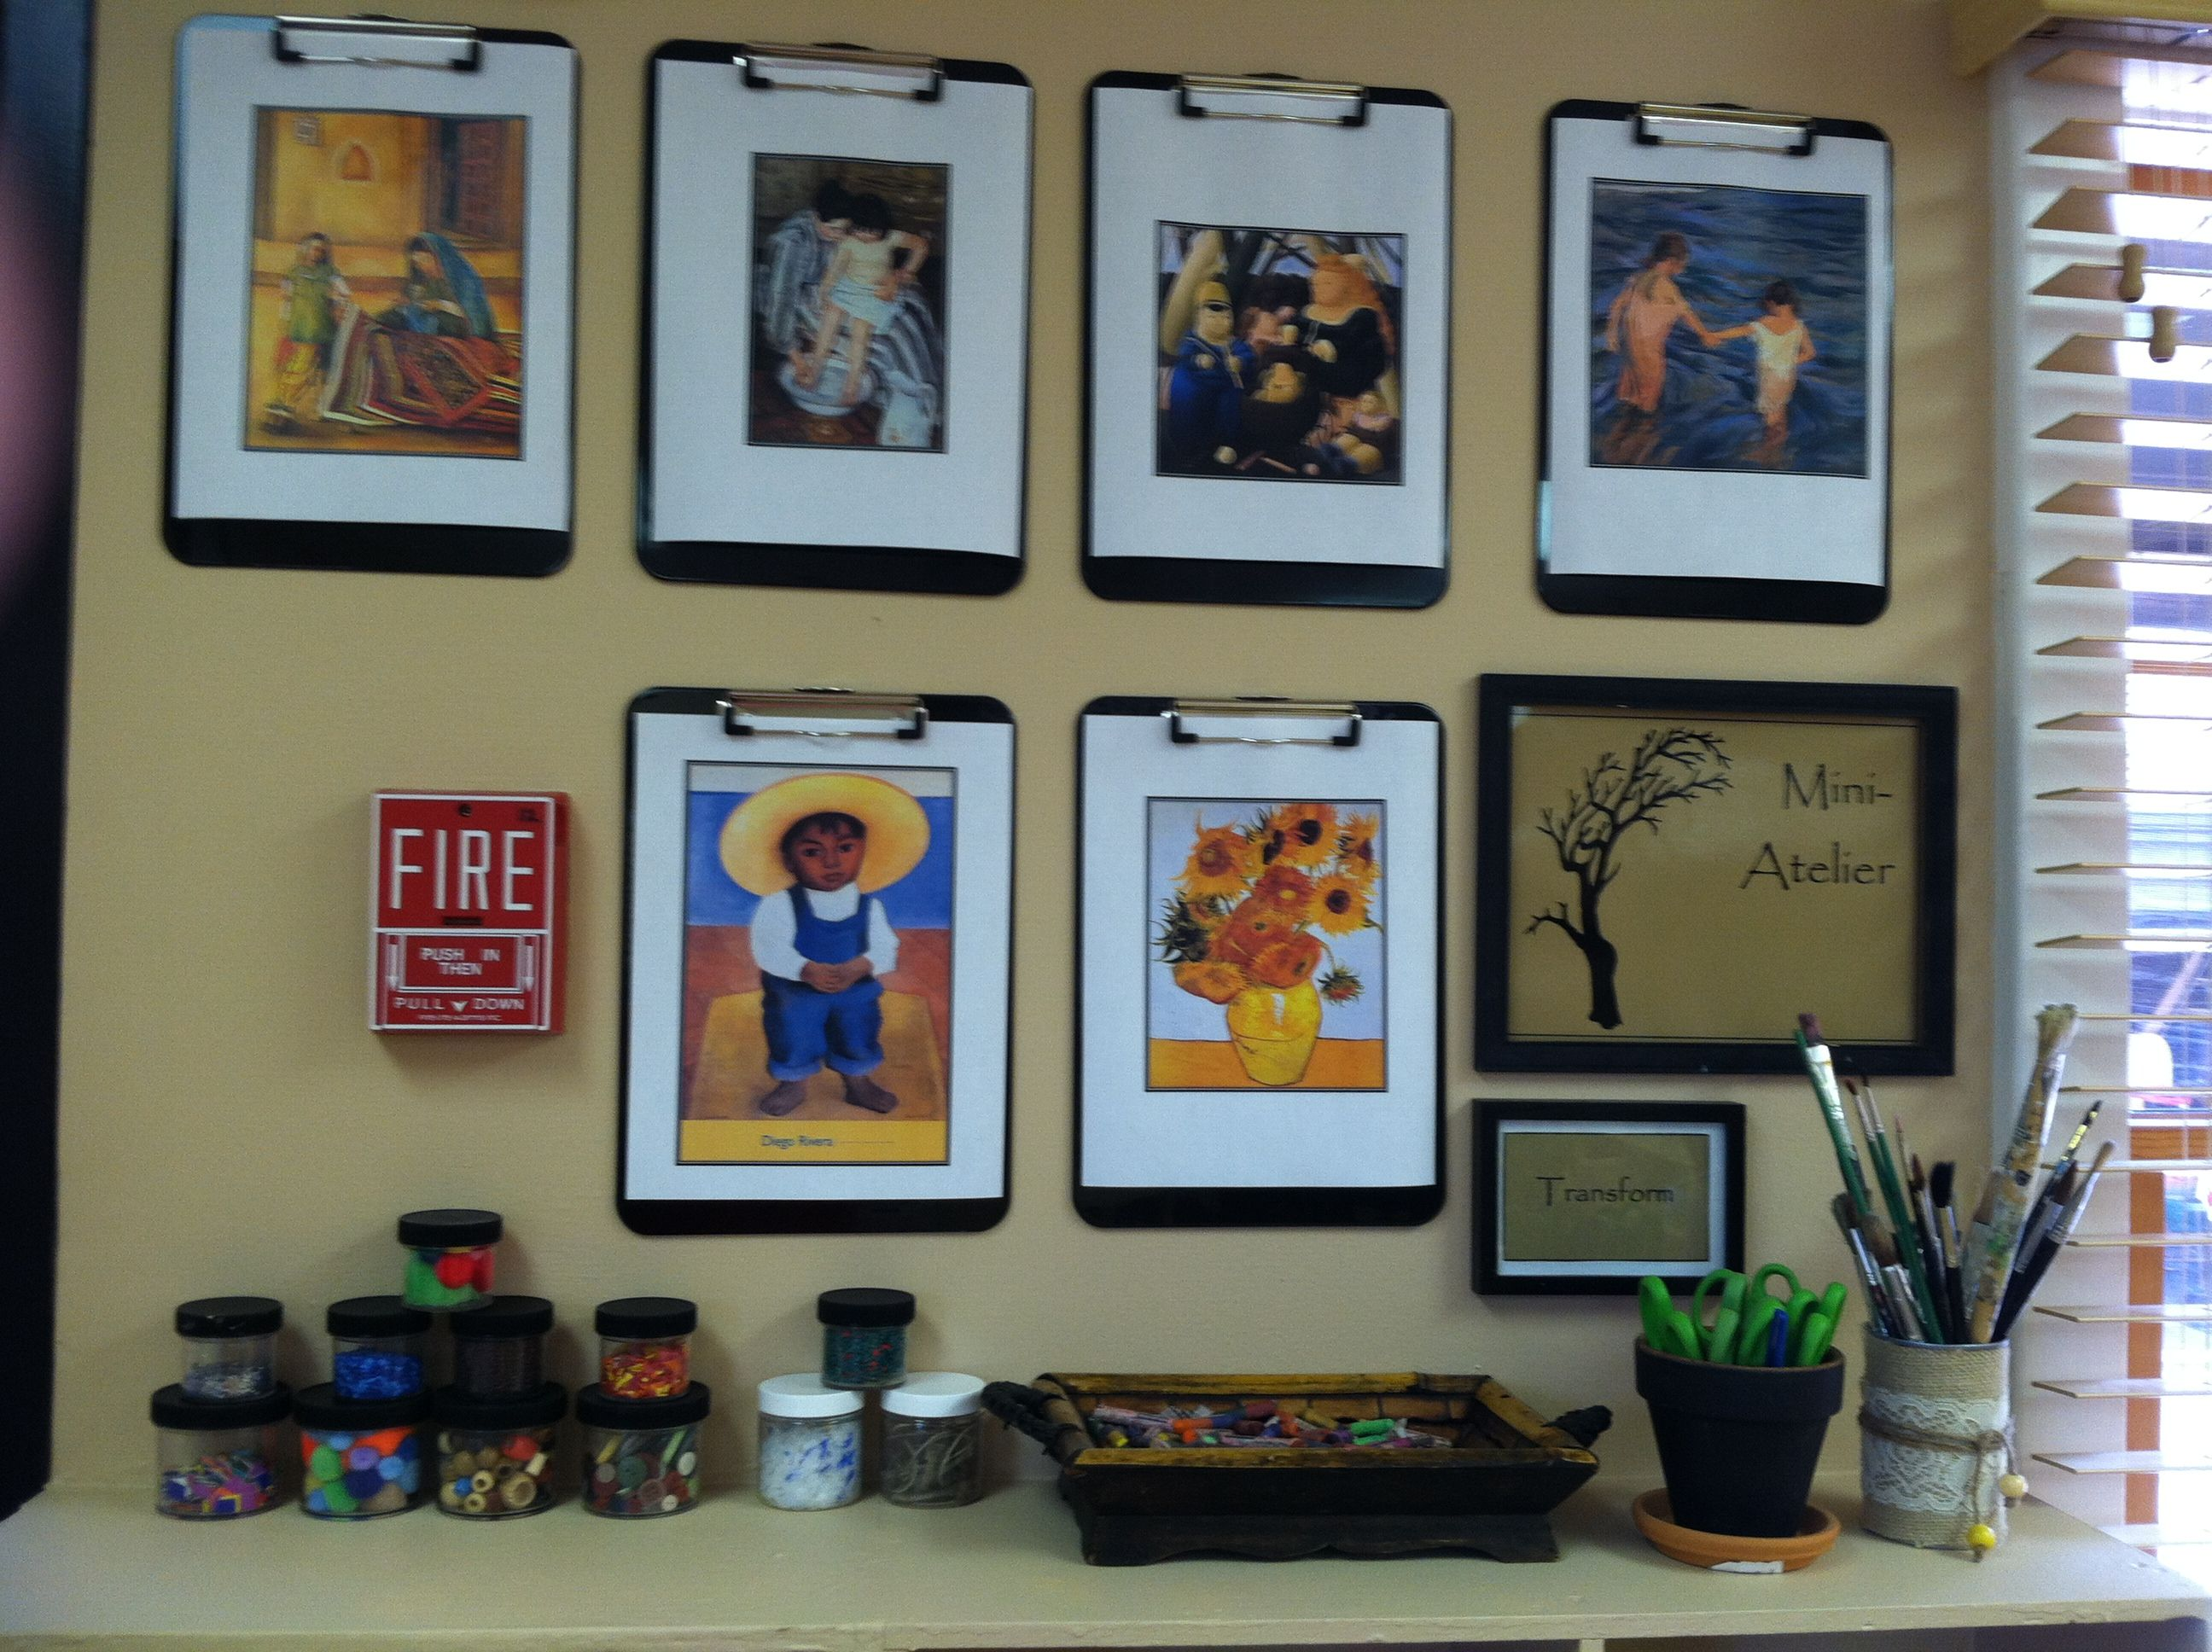 Mini-atelier Wall Inspiration #reggio #elmhurstacademy Classroom Infant Reggio